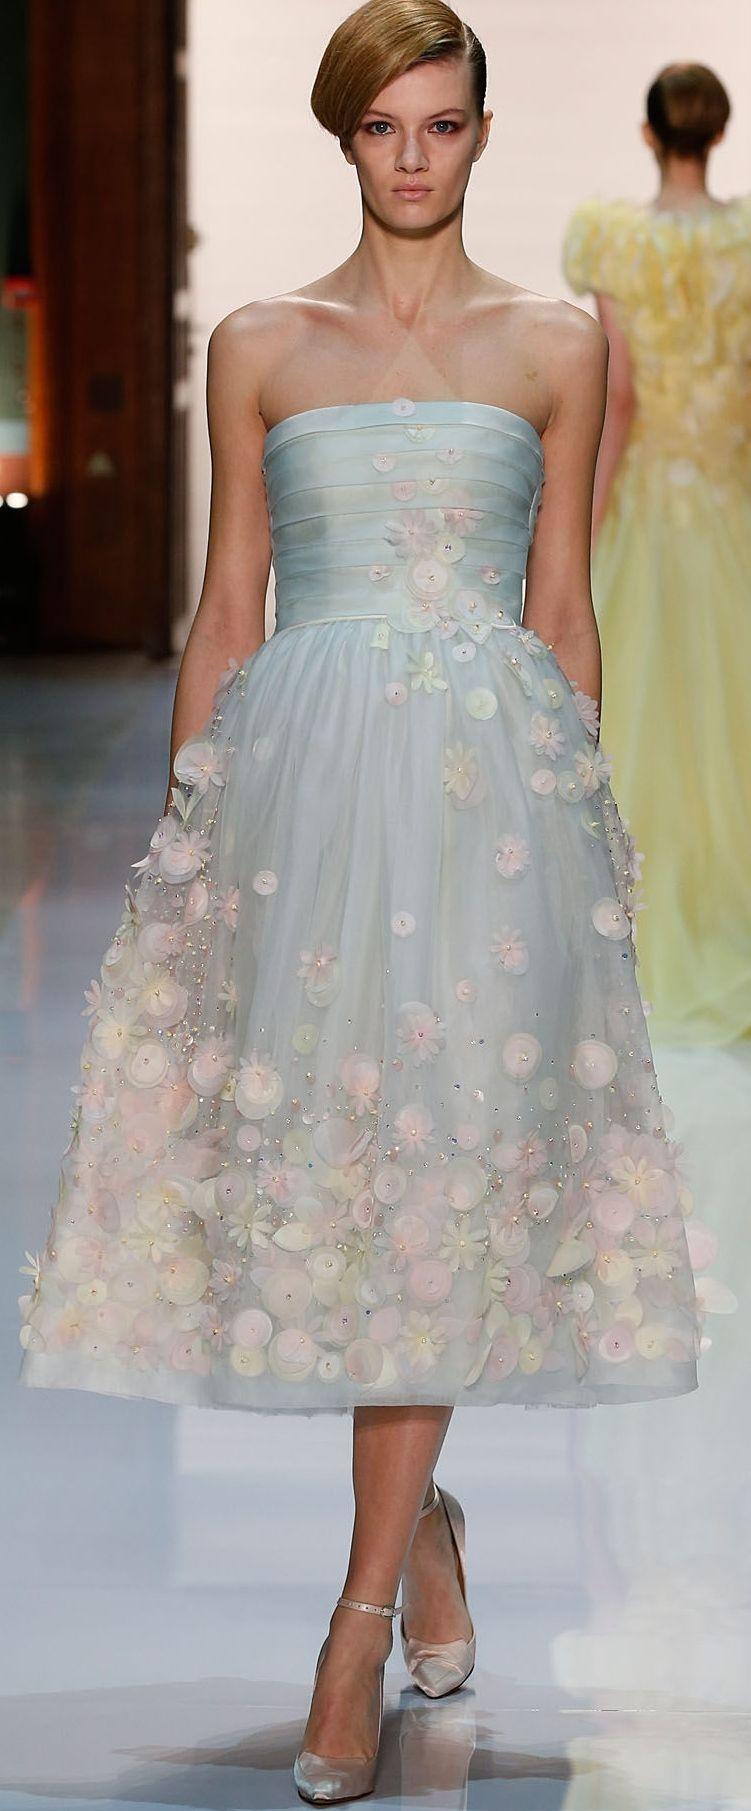 Georges hobeika civil wedding pinterest gowns clothes